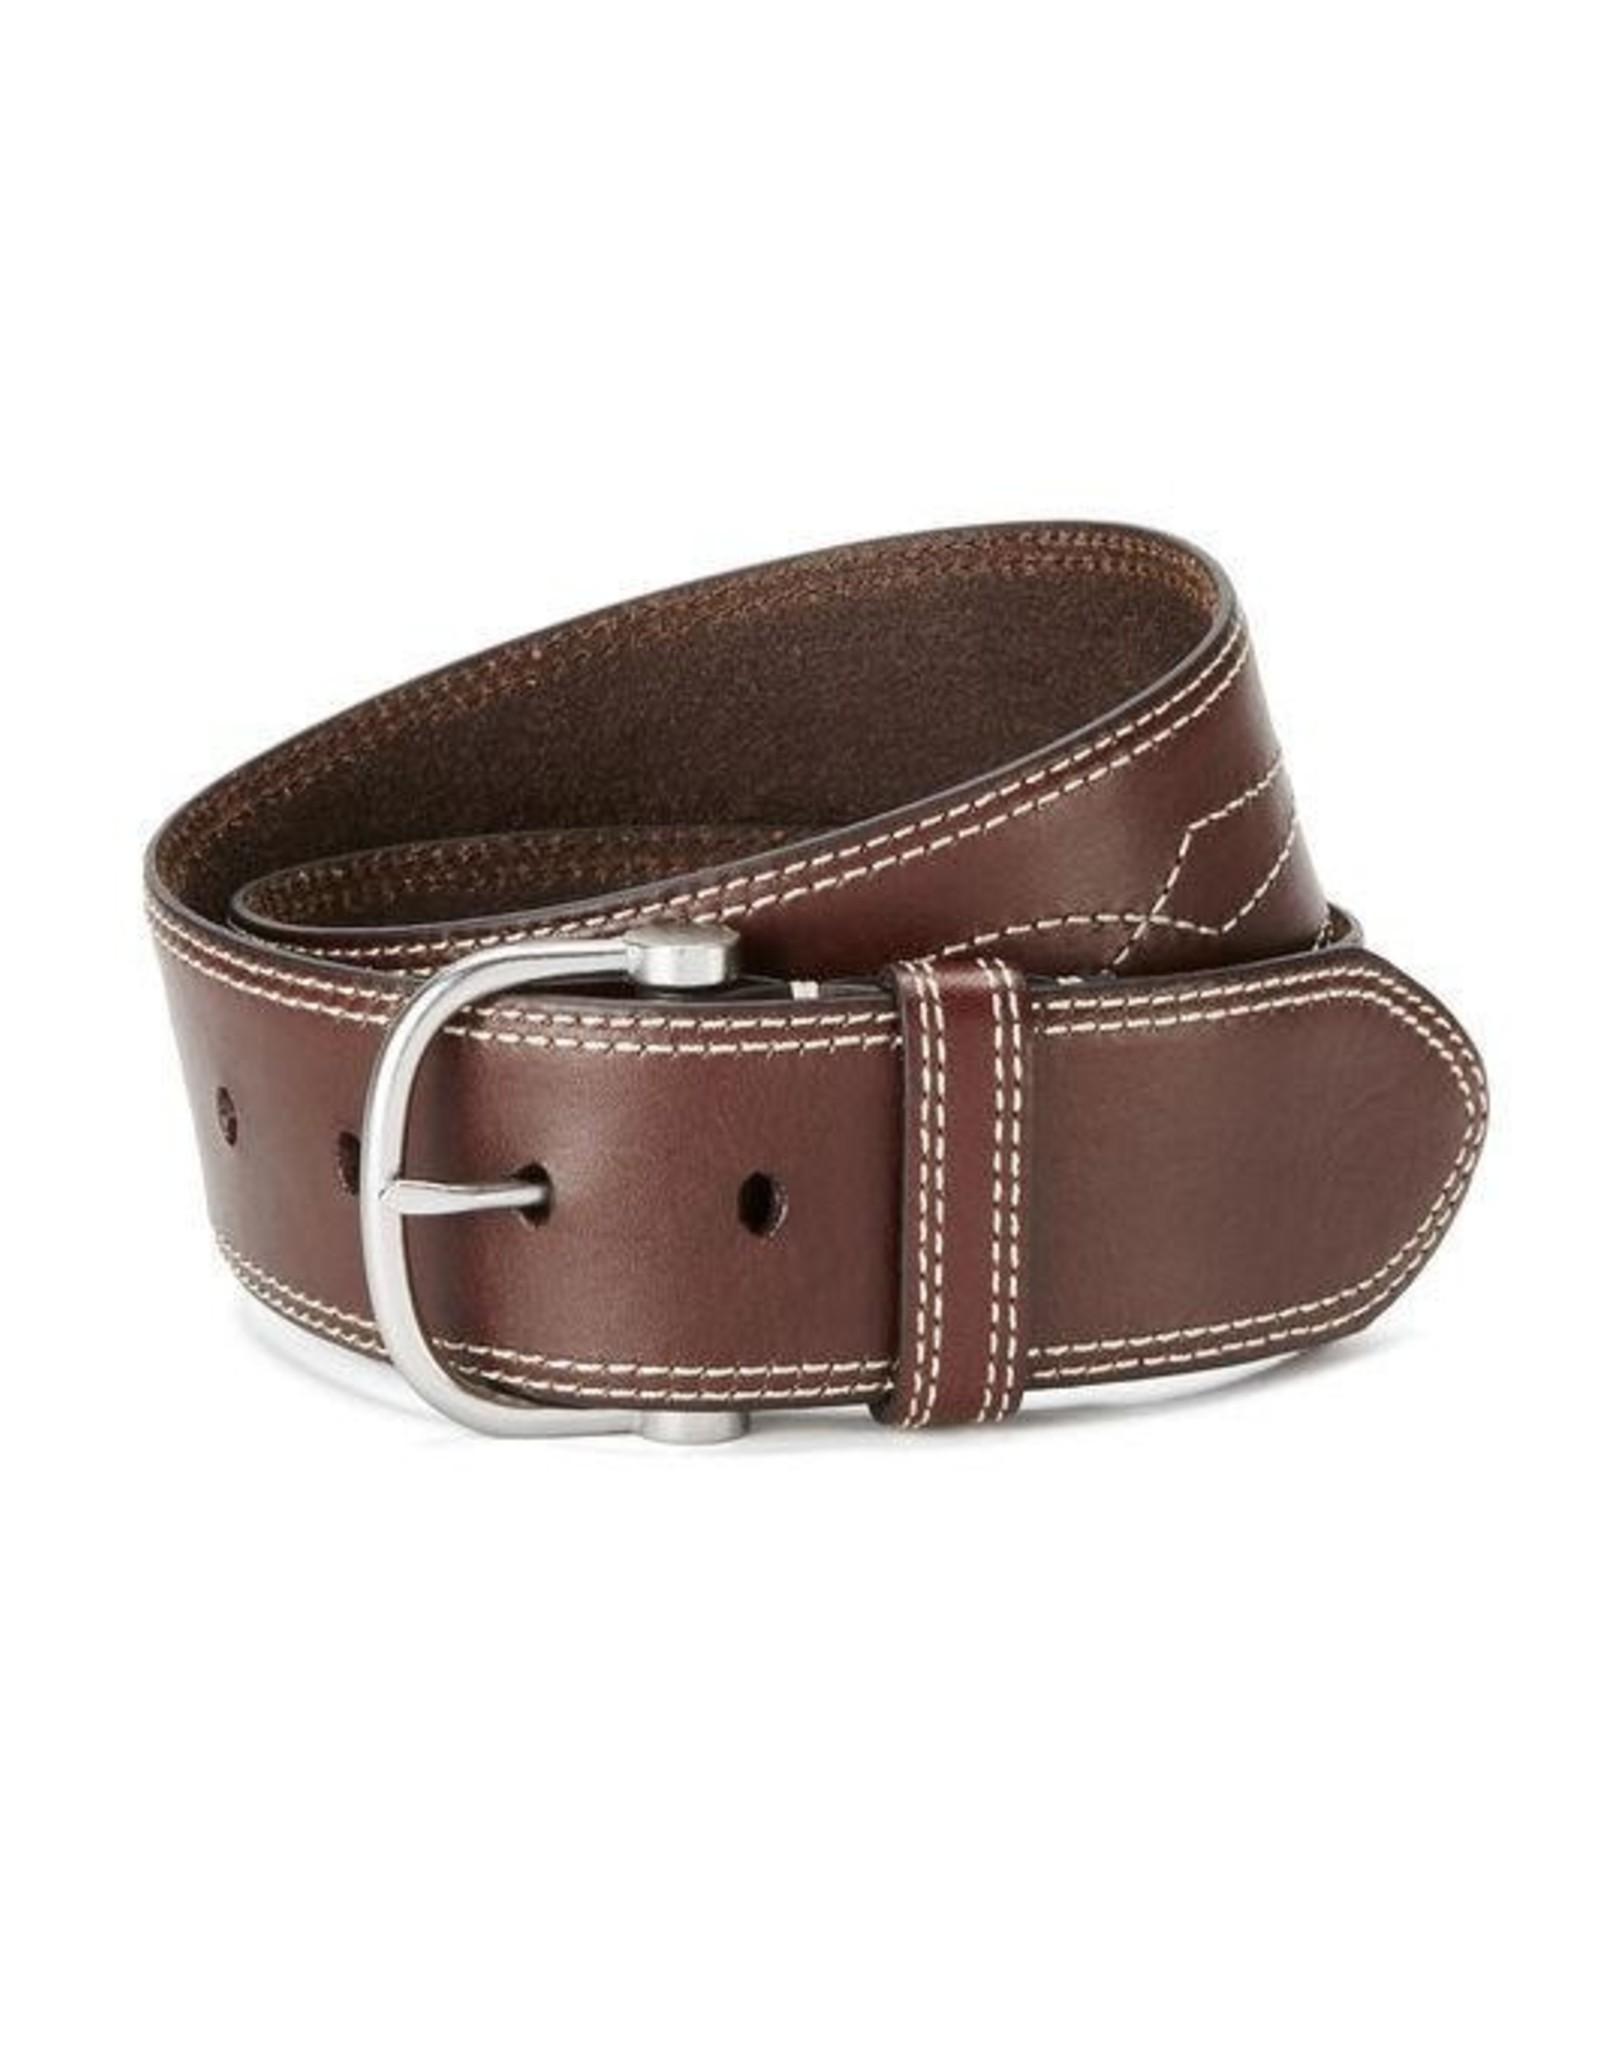 Ariat Saddlery Stitched Belt